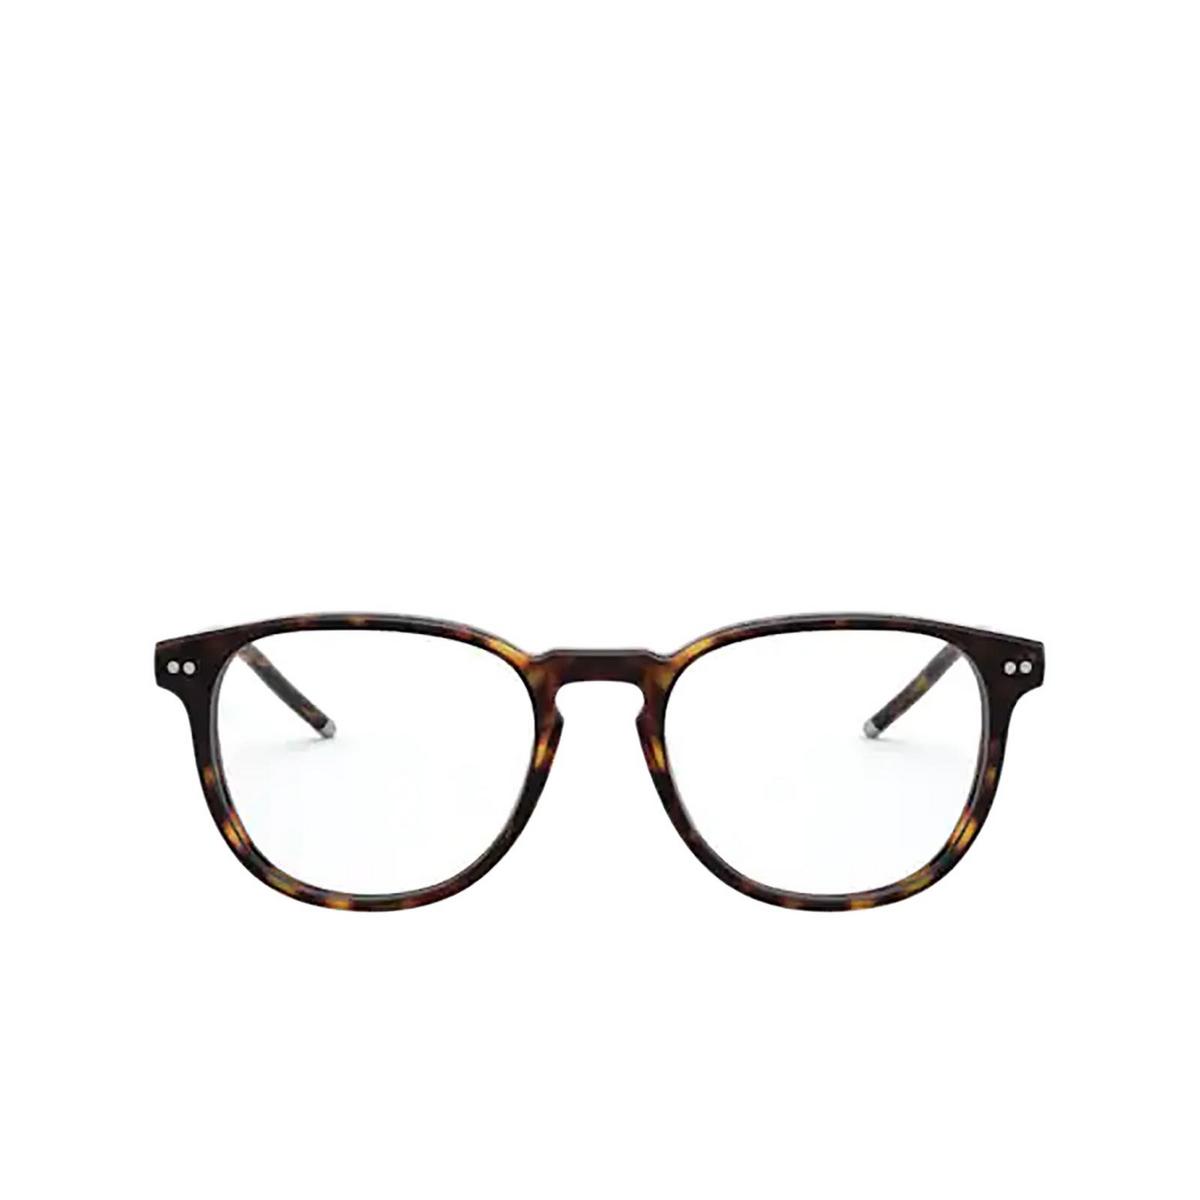 Polo Ralph Lauren® Square Eyeglasses: PH2225 color Shiny Dark Havana 5003 - front view.